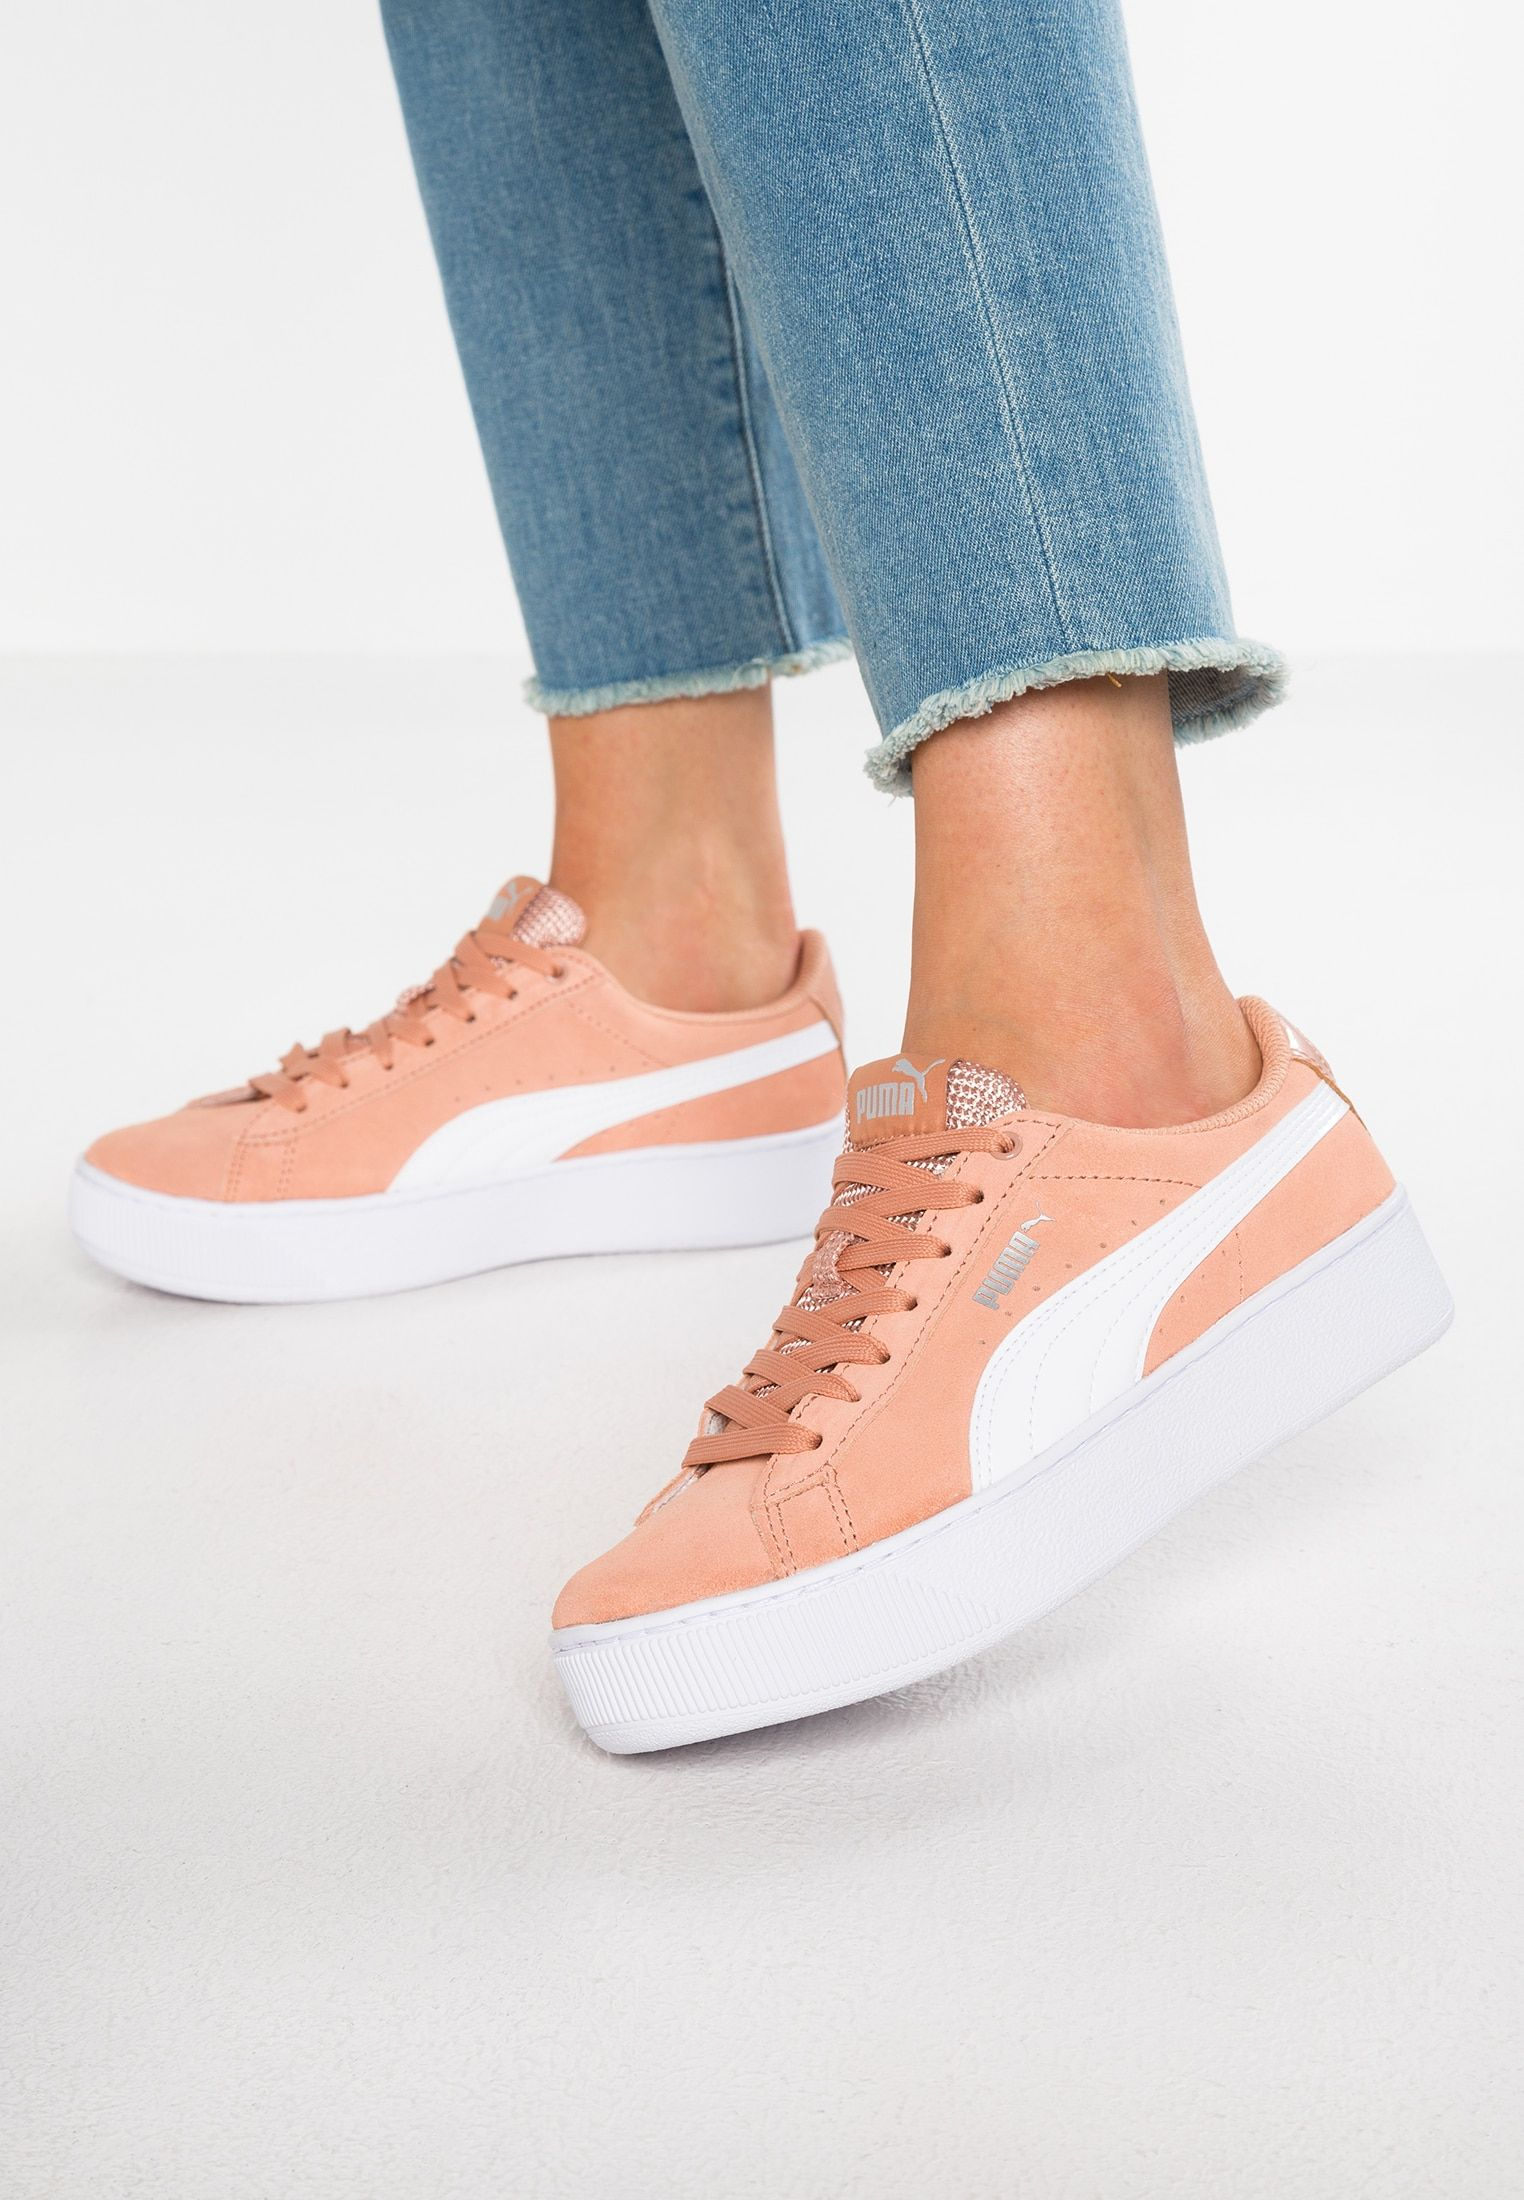 low cost 0c5df 29bc9 Puma VIKKY PLATFORM - Sneakers - dusty coral white - Zalando.se